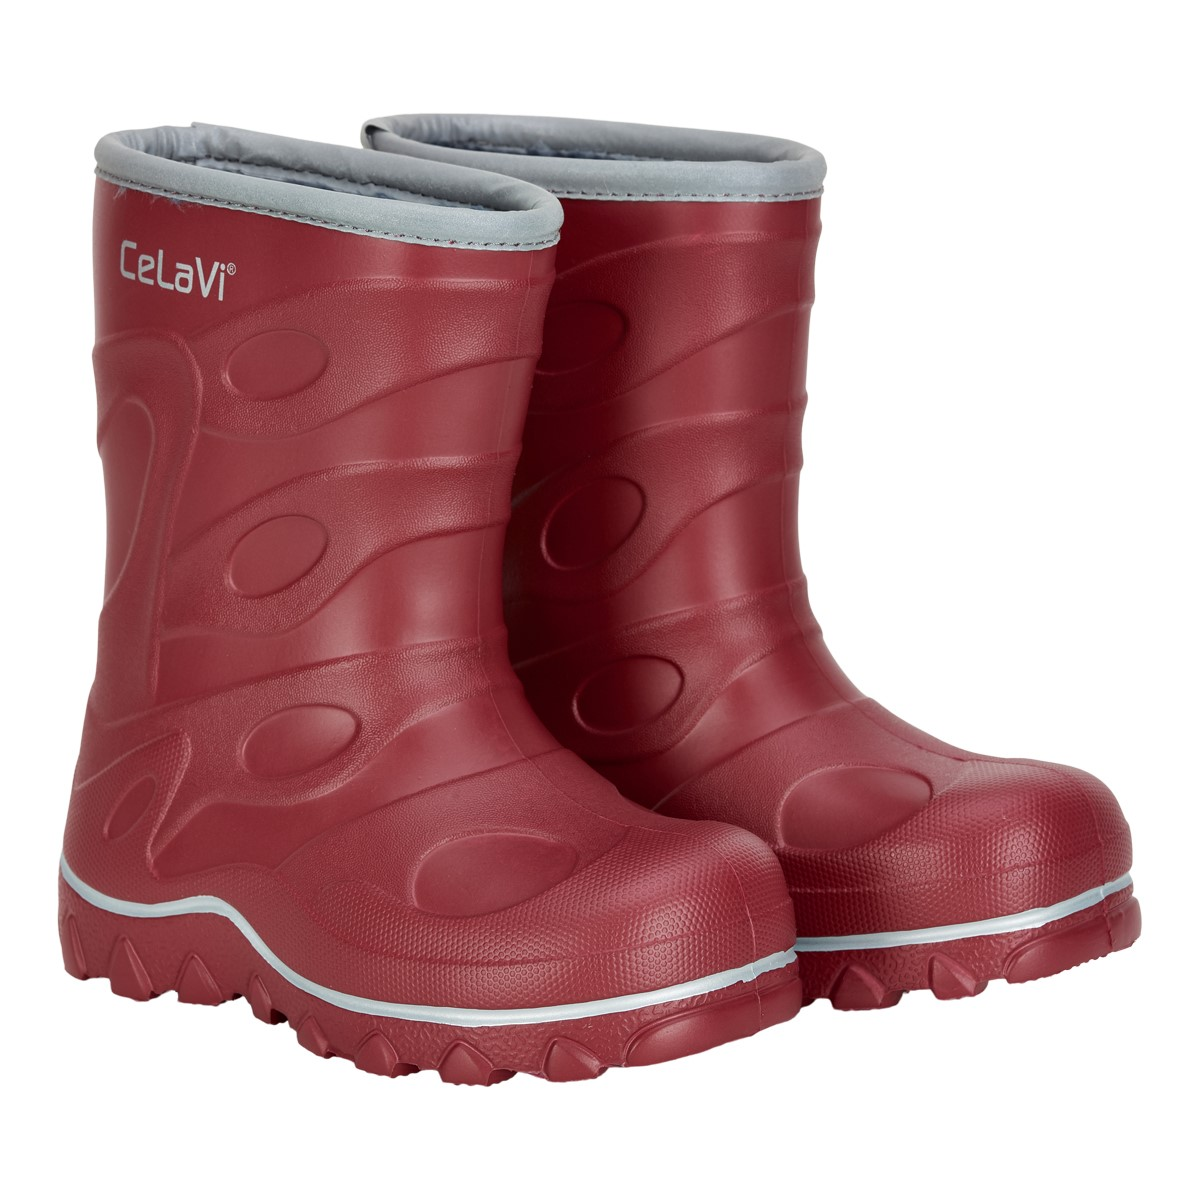 CeLaVi 320101 Termo gummistøvle